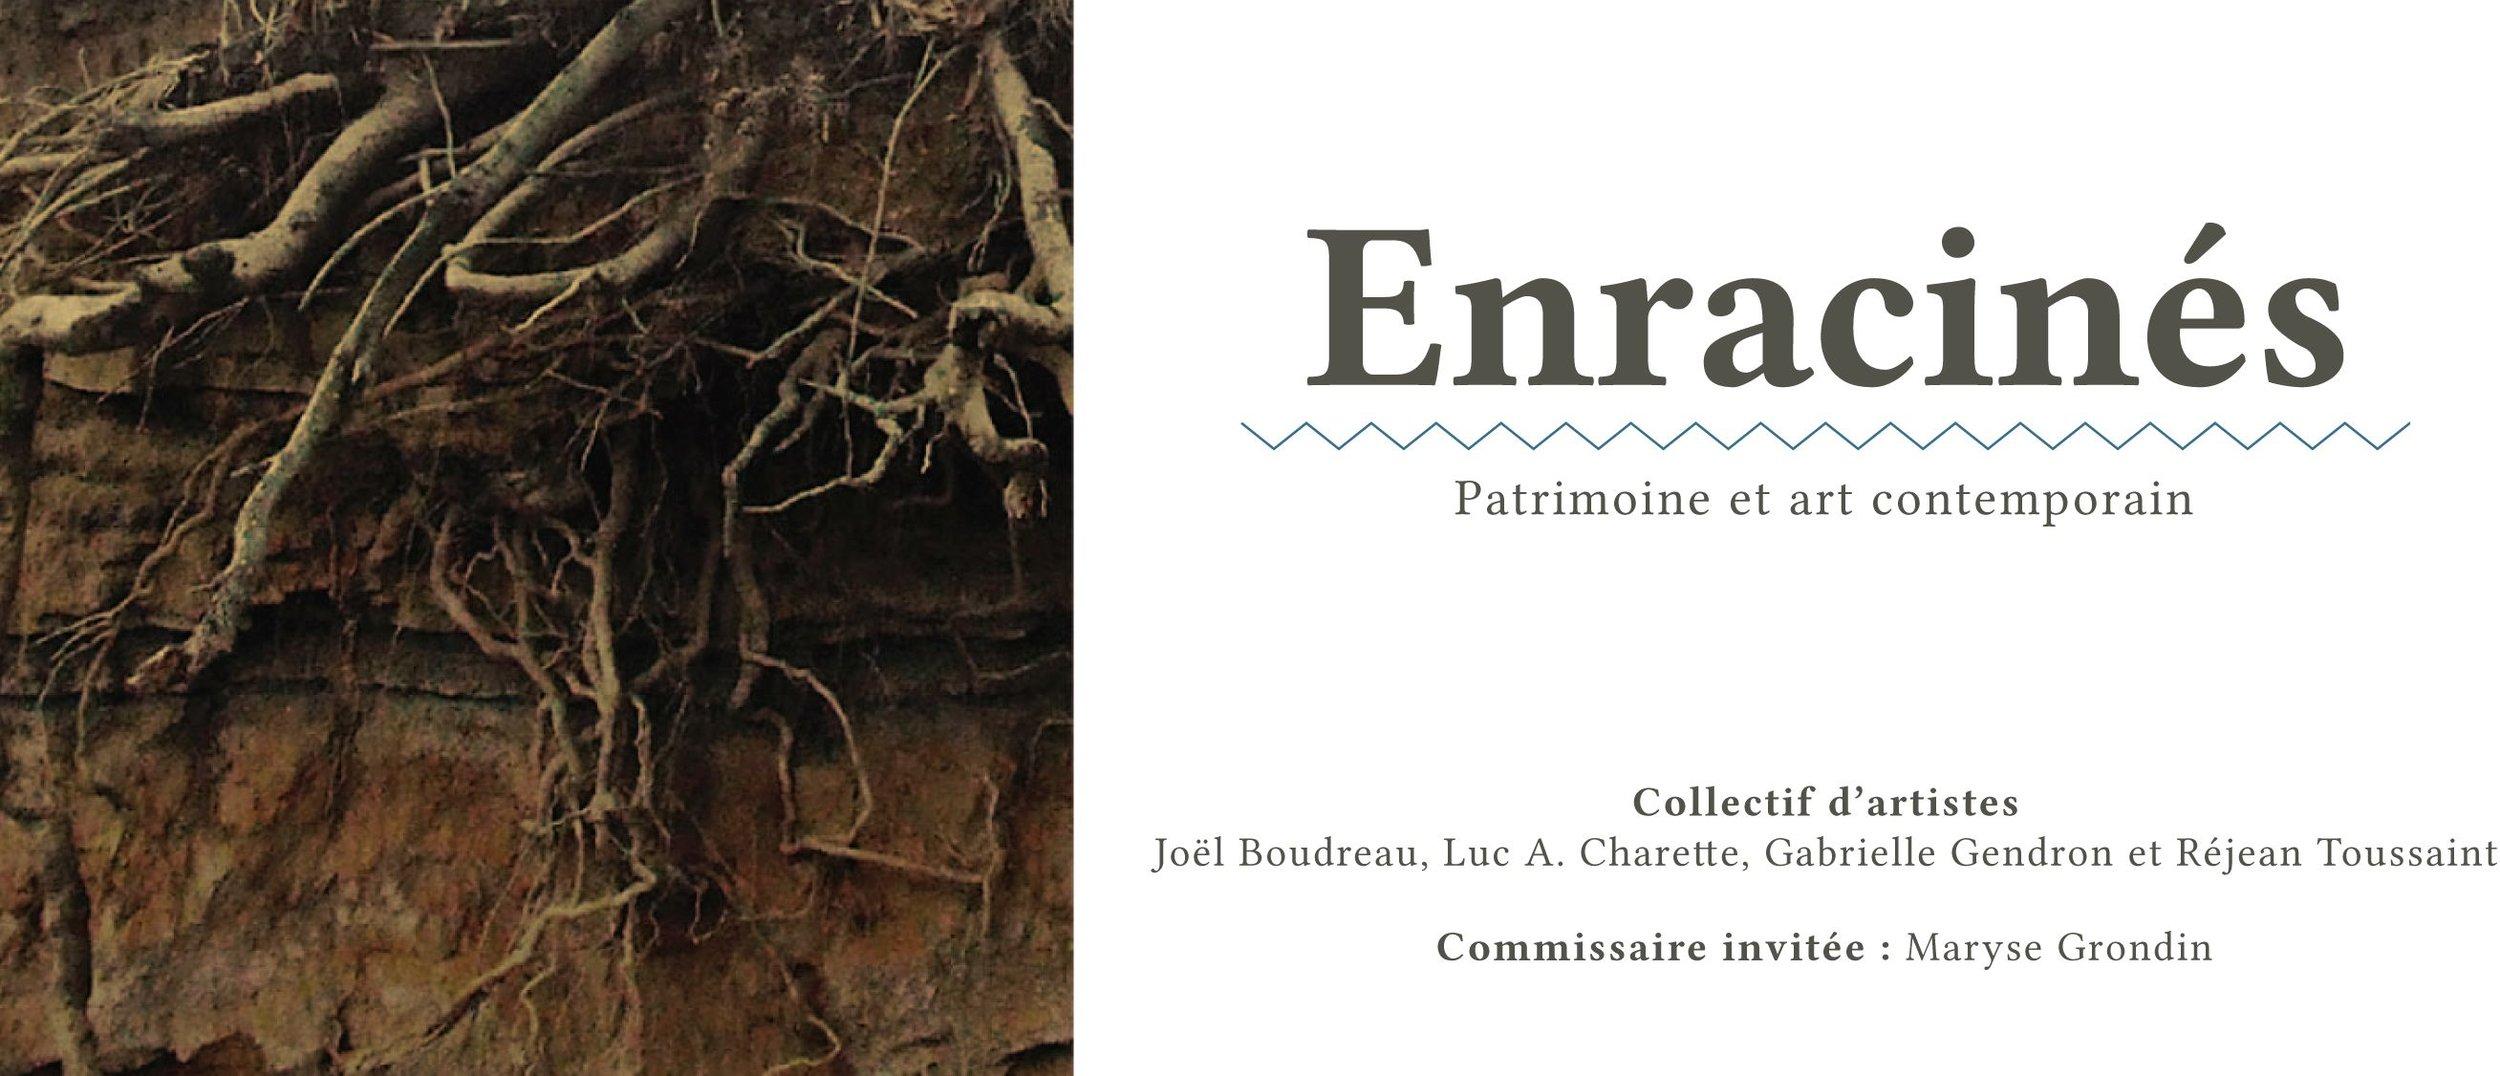 Invitation Enracinés1.jpg